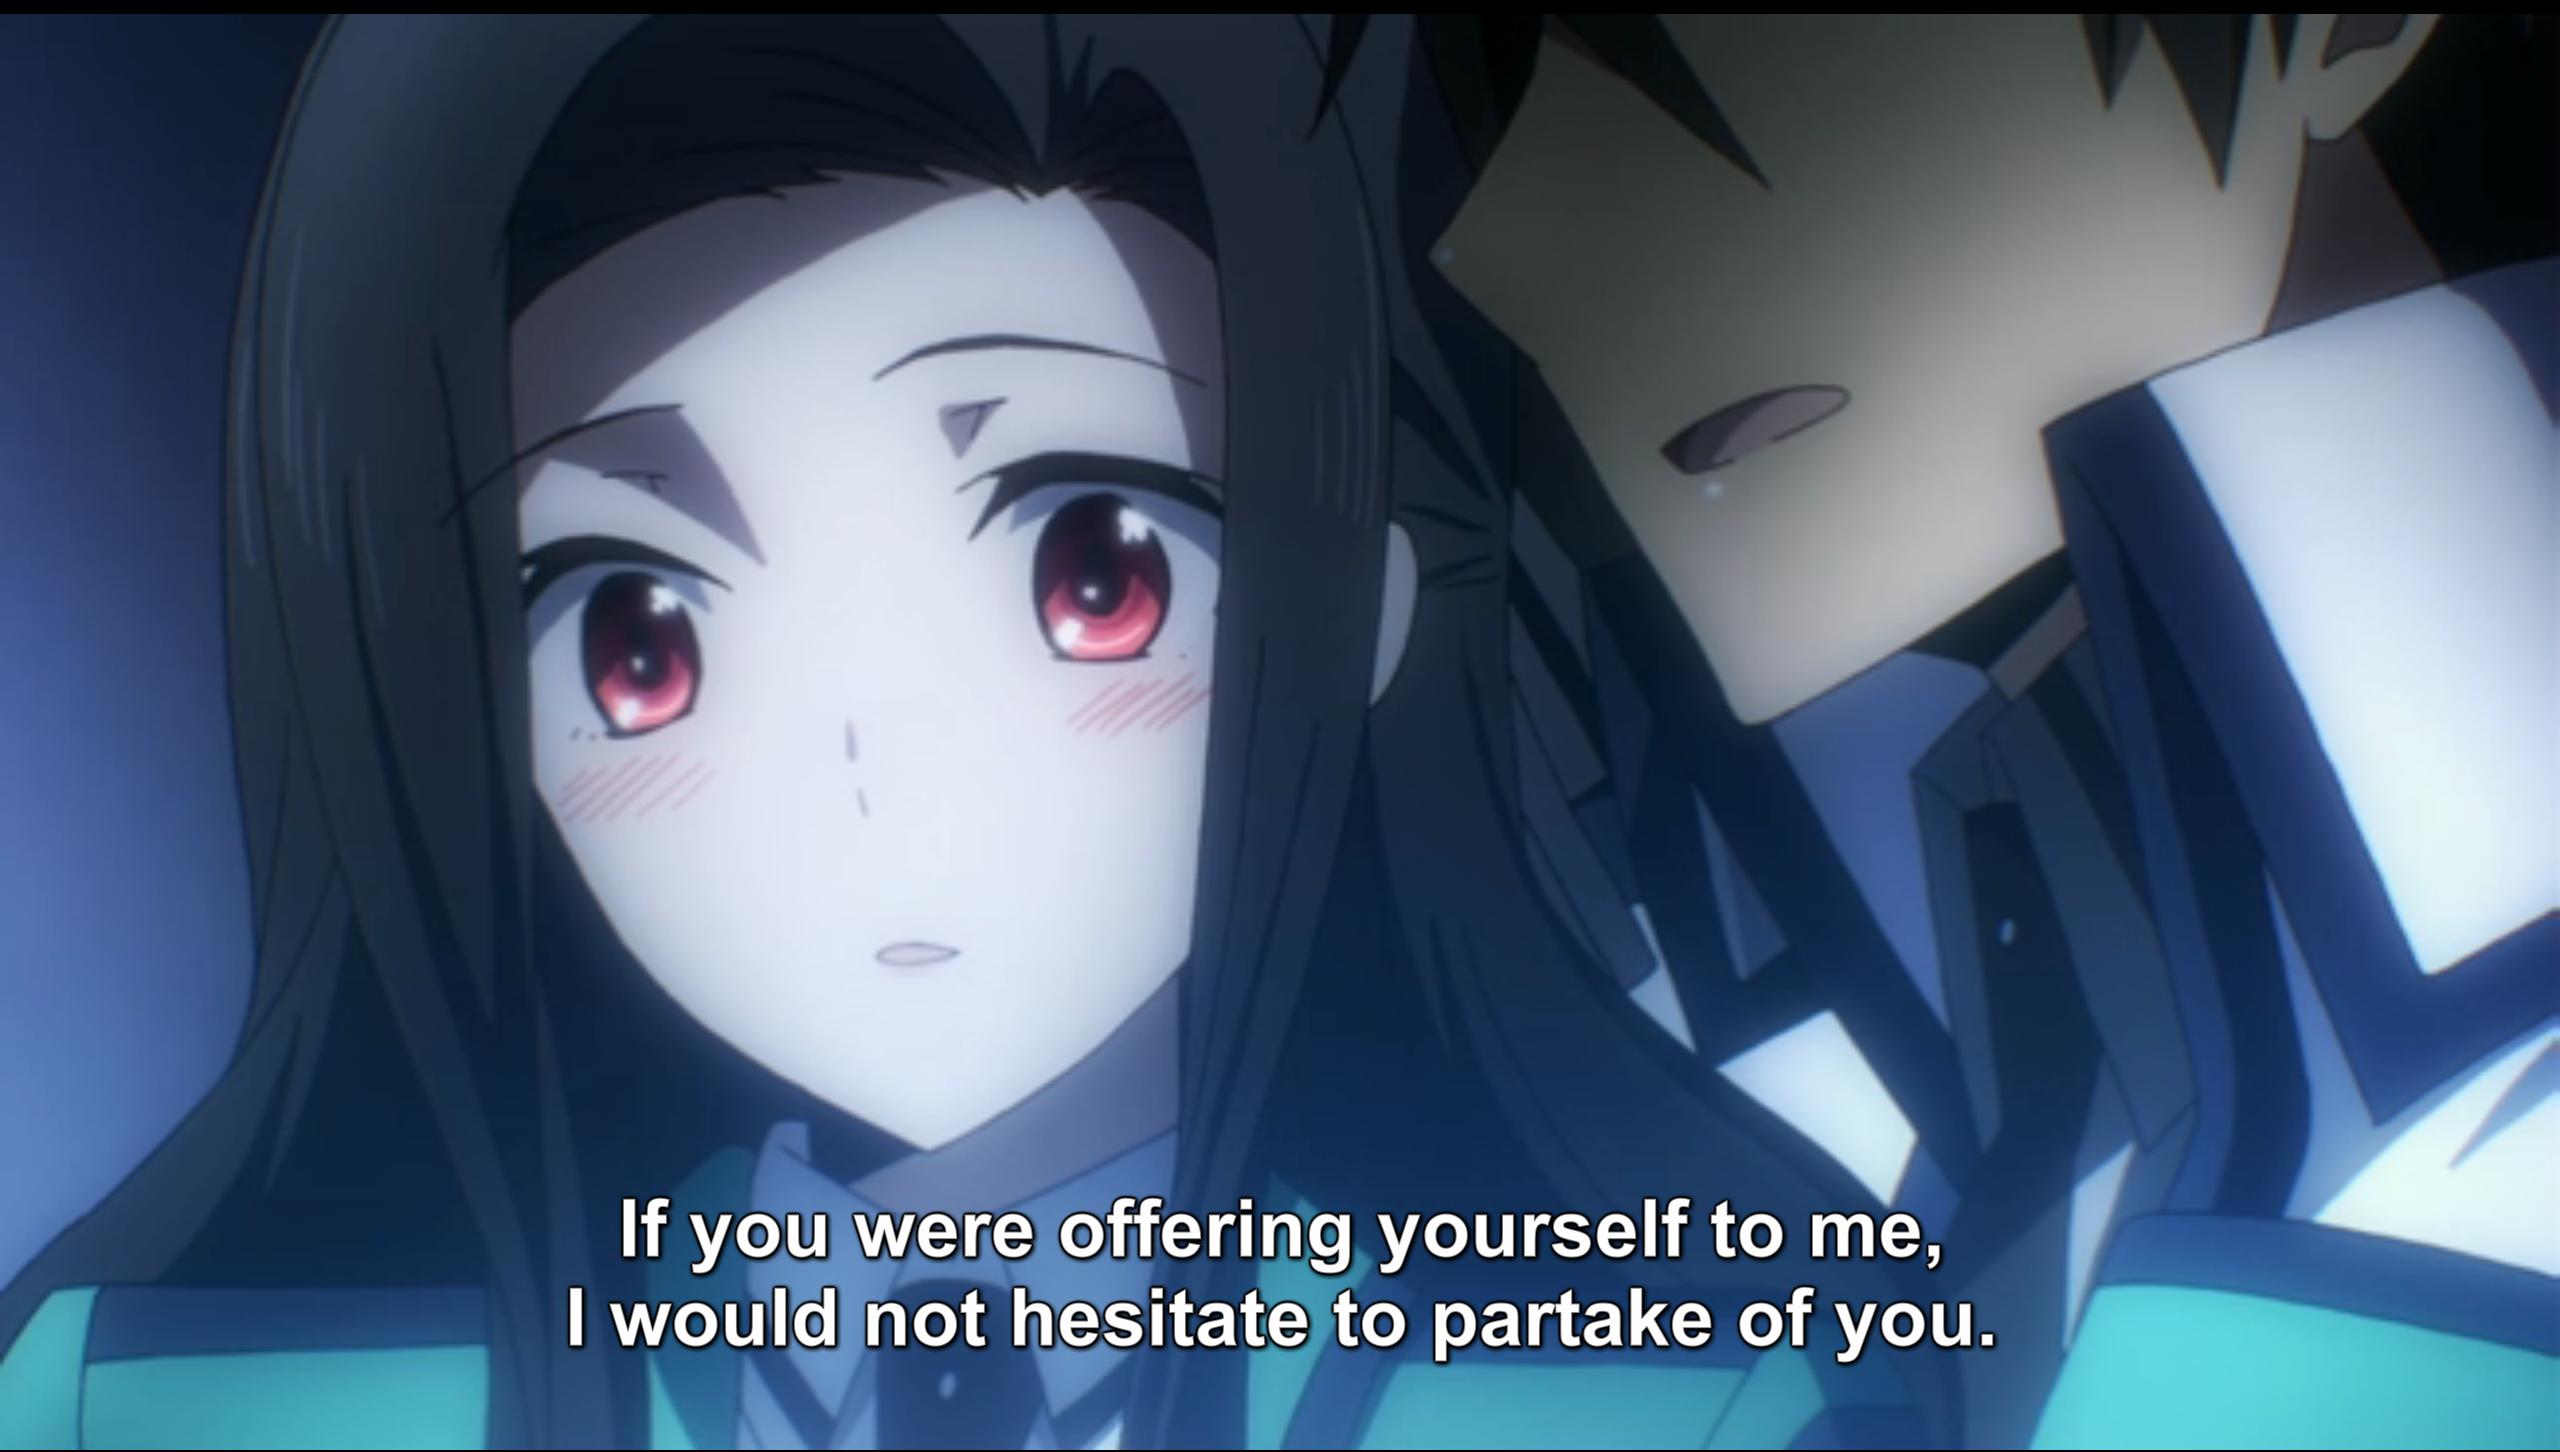 The Irregular at Magic High School episode 20 Tatsuya and